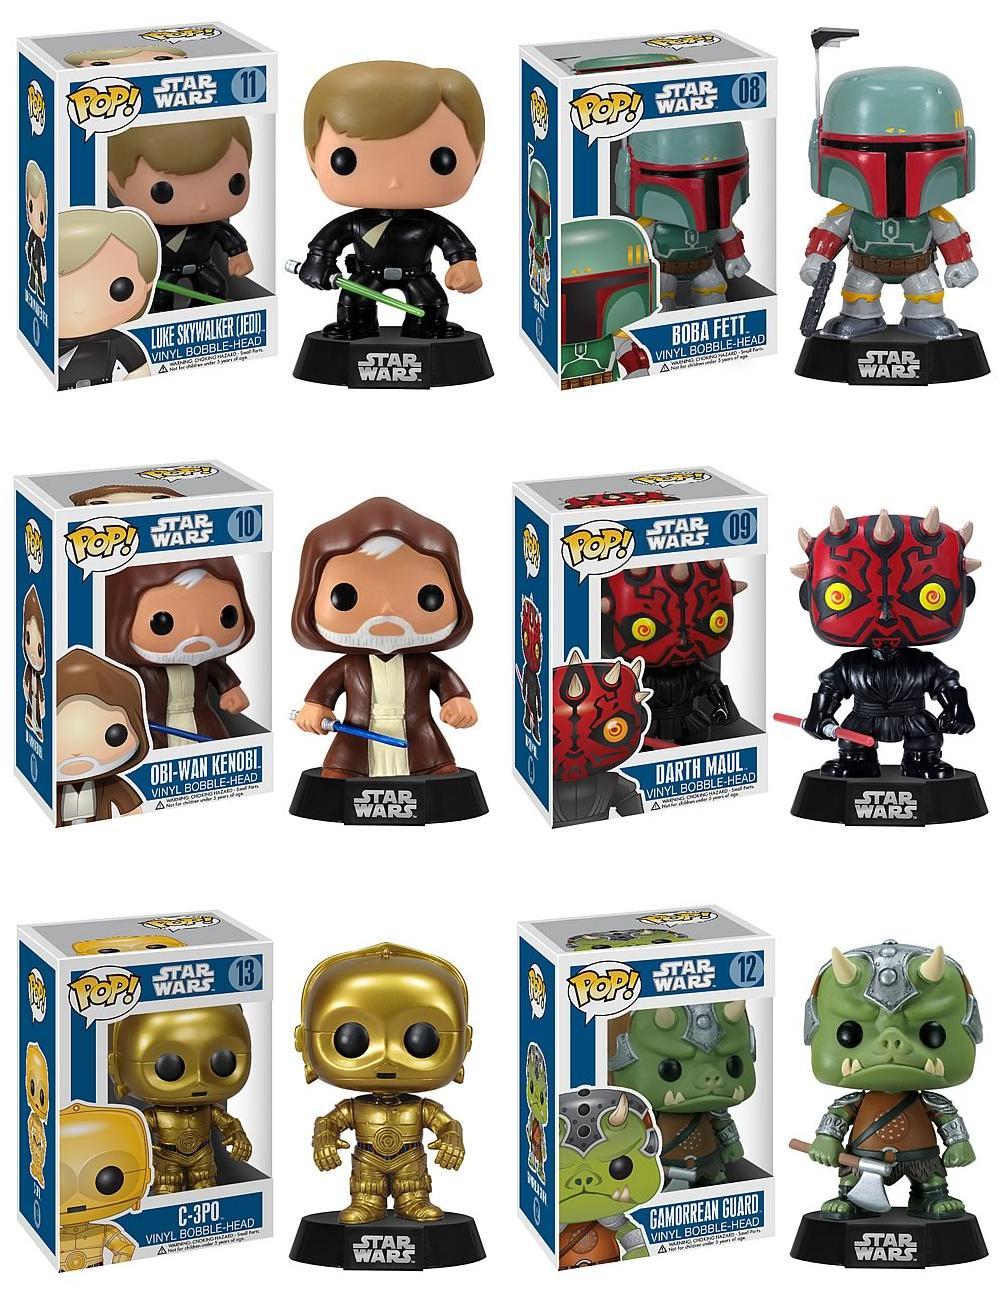 Star+Wars+Pop%2521+Vinyl+Bobble+Heads+Wave+2+-+Jedi+Luke+Skywalker%252C+Boba+Fett%252C+Obi-Wan+Kenobi%252C+Darth+Maul%252C+C-3PO+%2526+Gamorrean+Guard.jpg